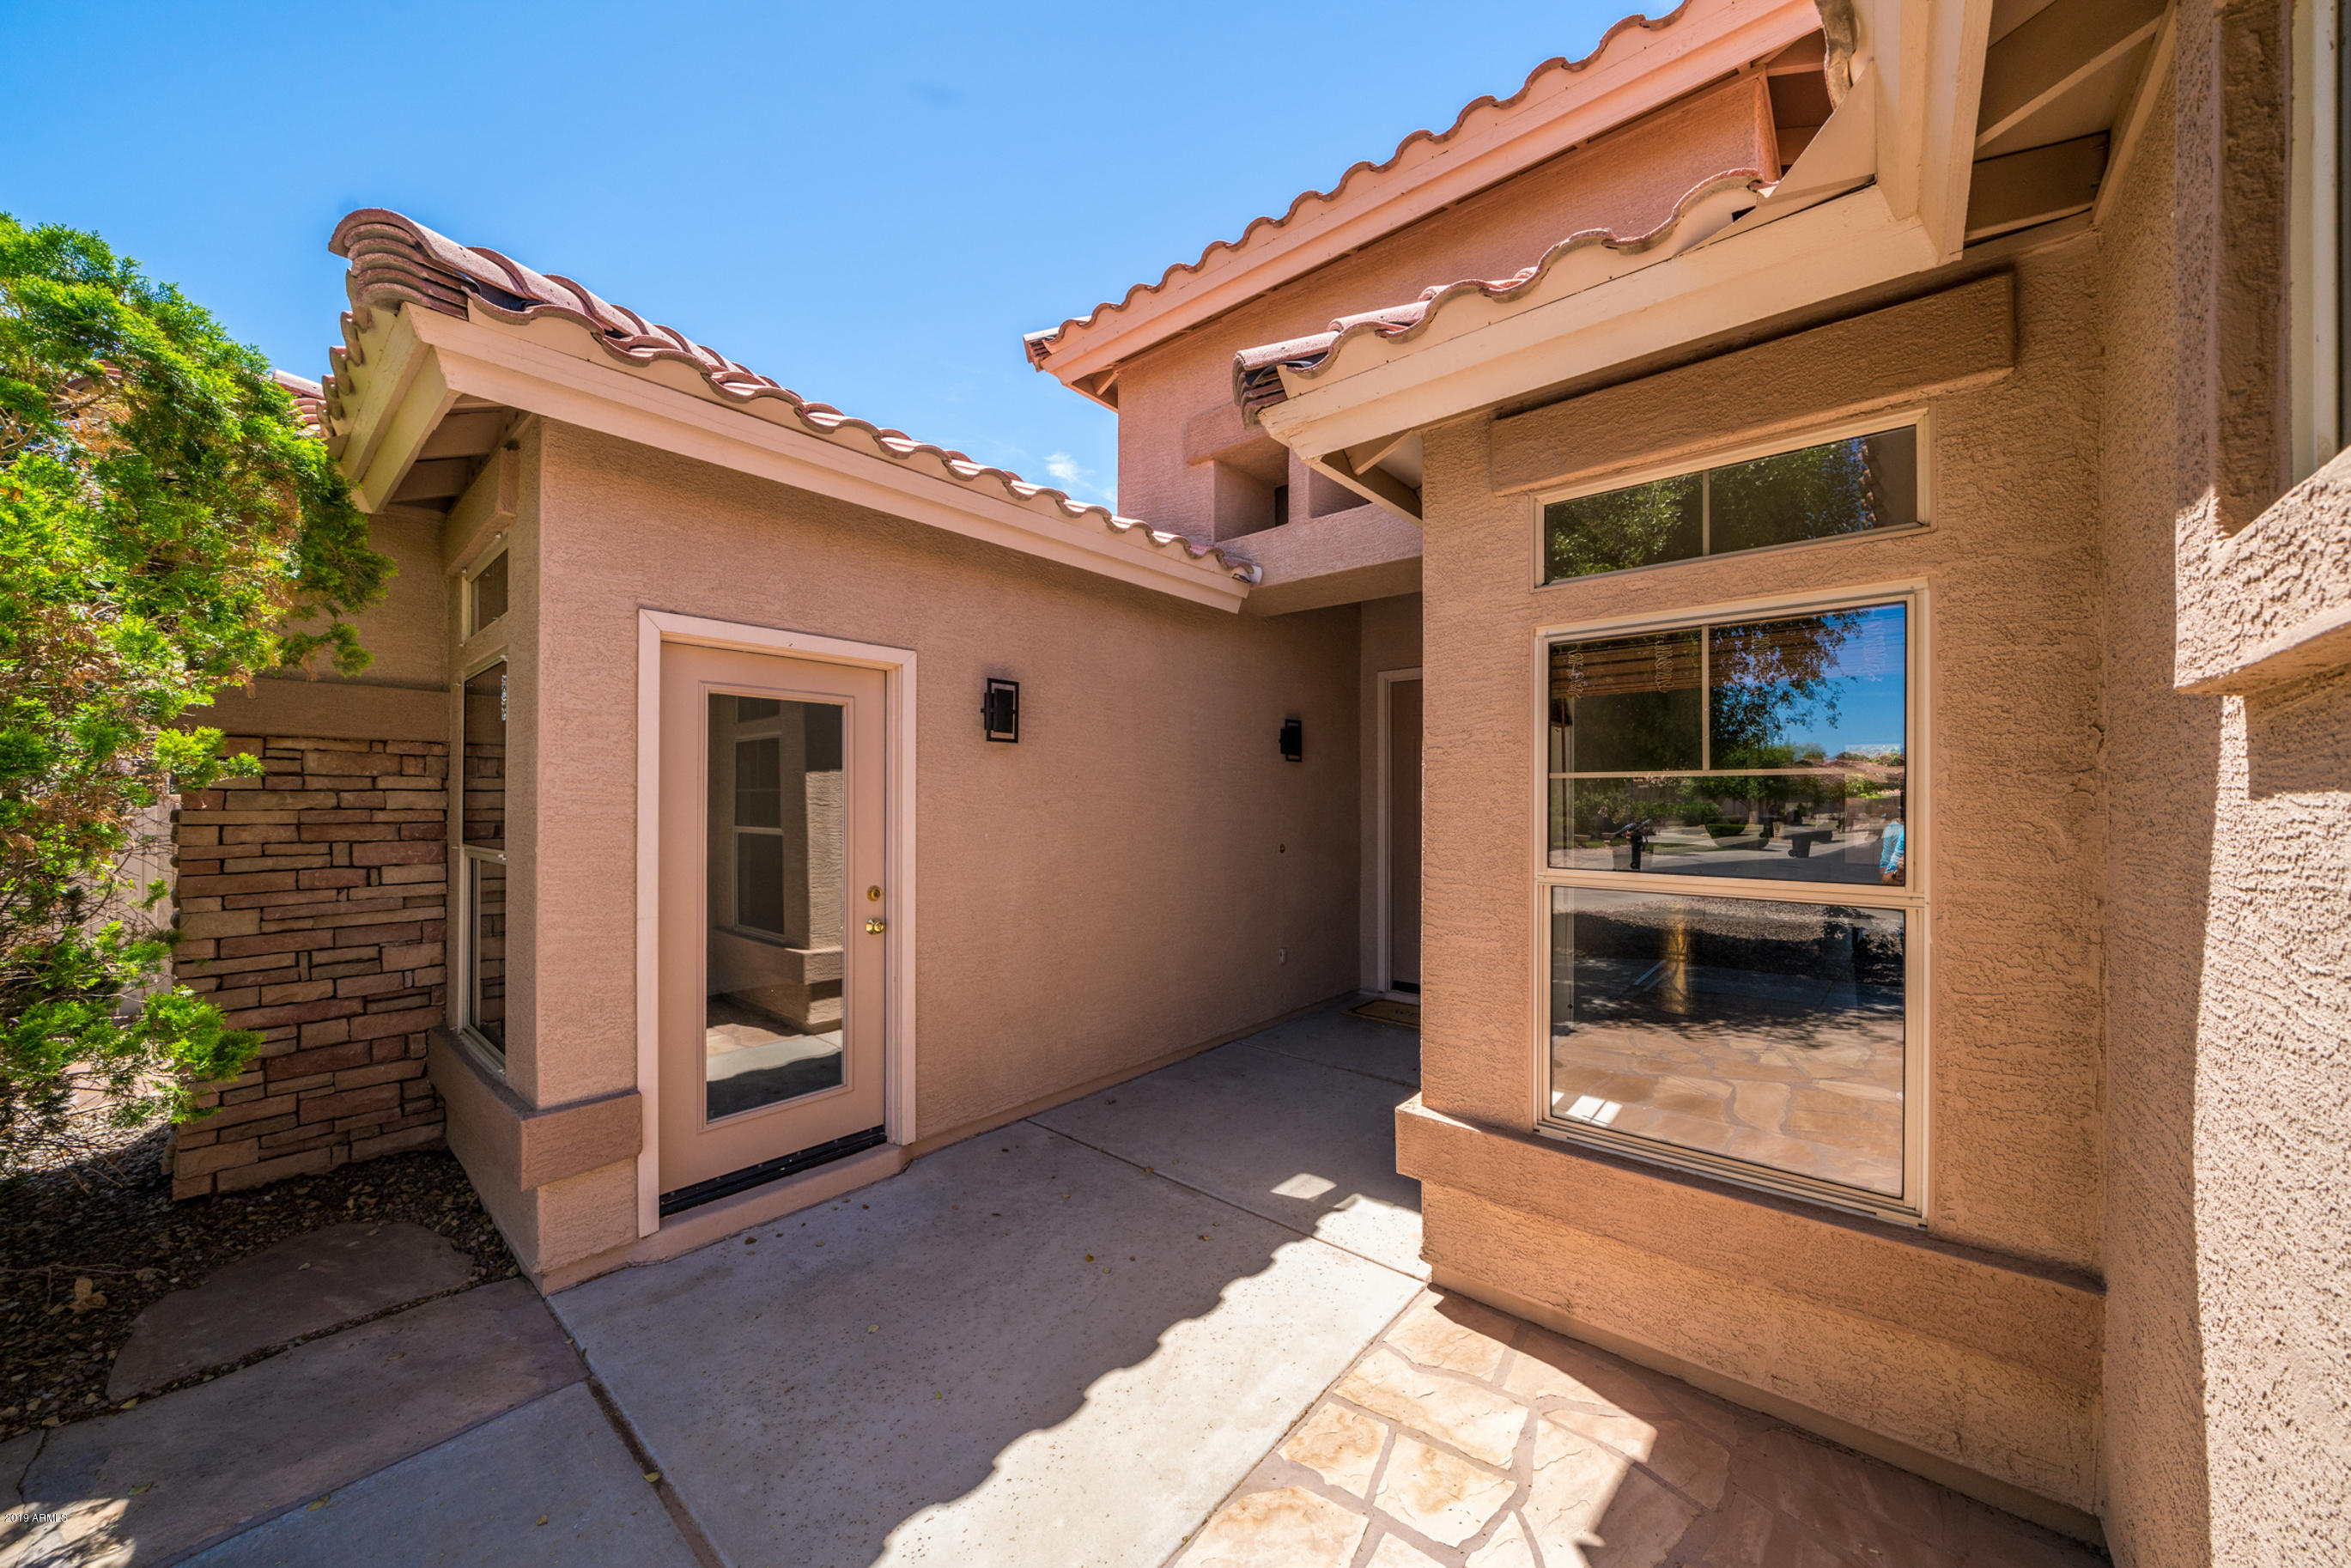 MLS 5915012 4980 S PEACHWOOD Drive, Gilbert, AZ 85298 Adult Community